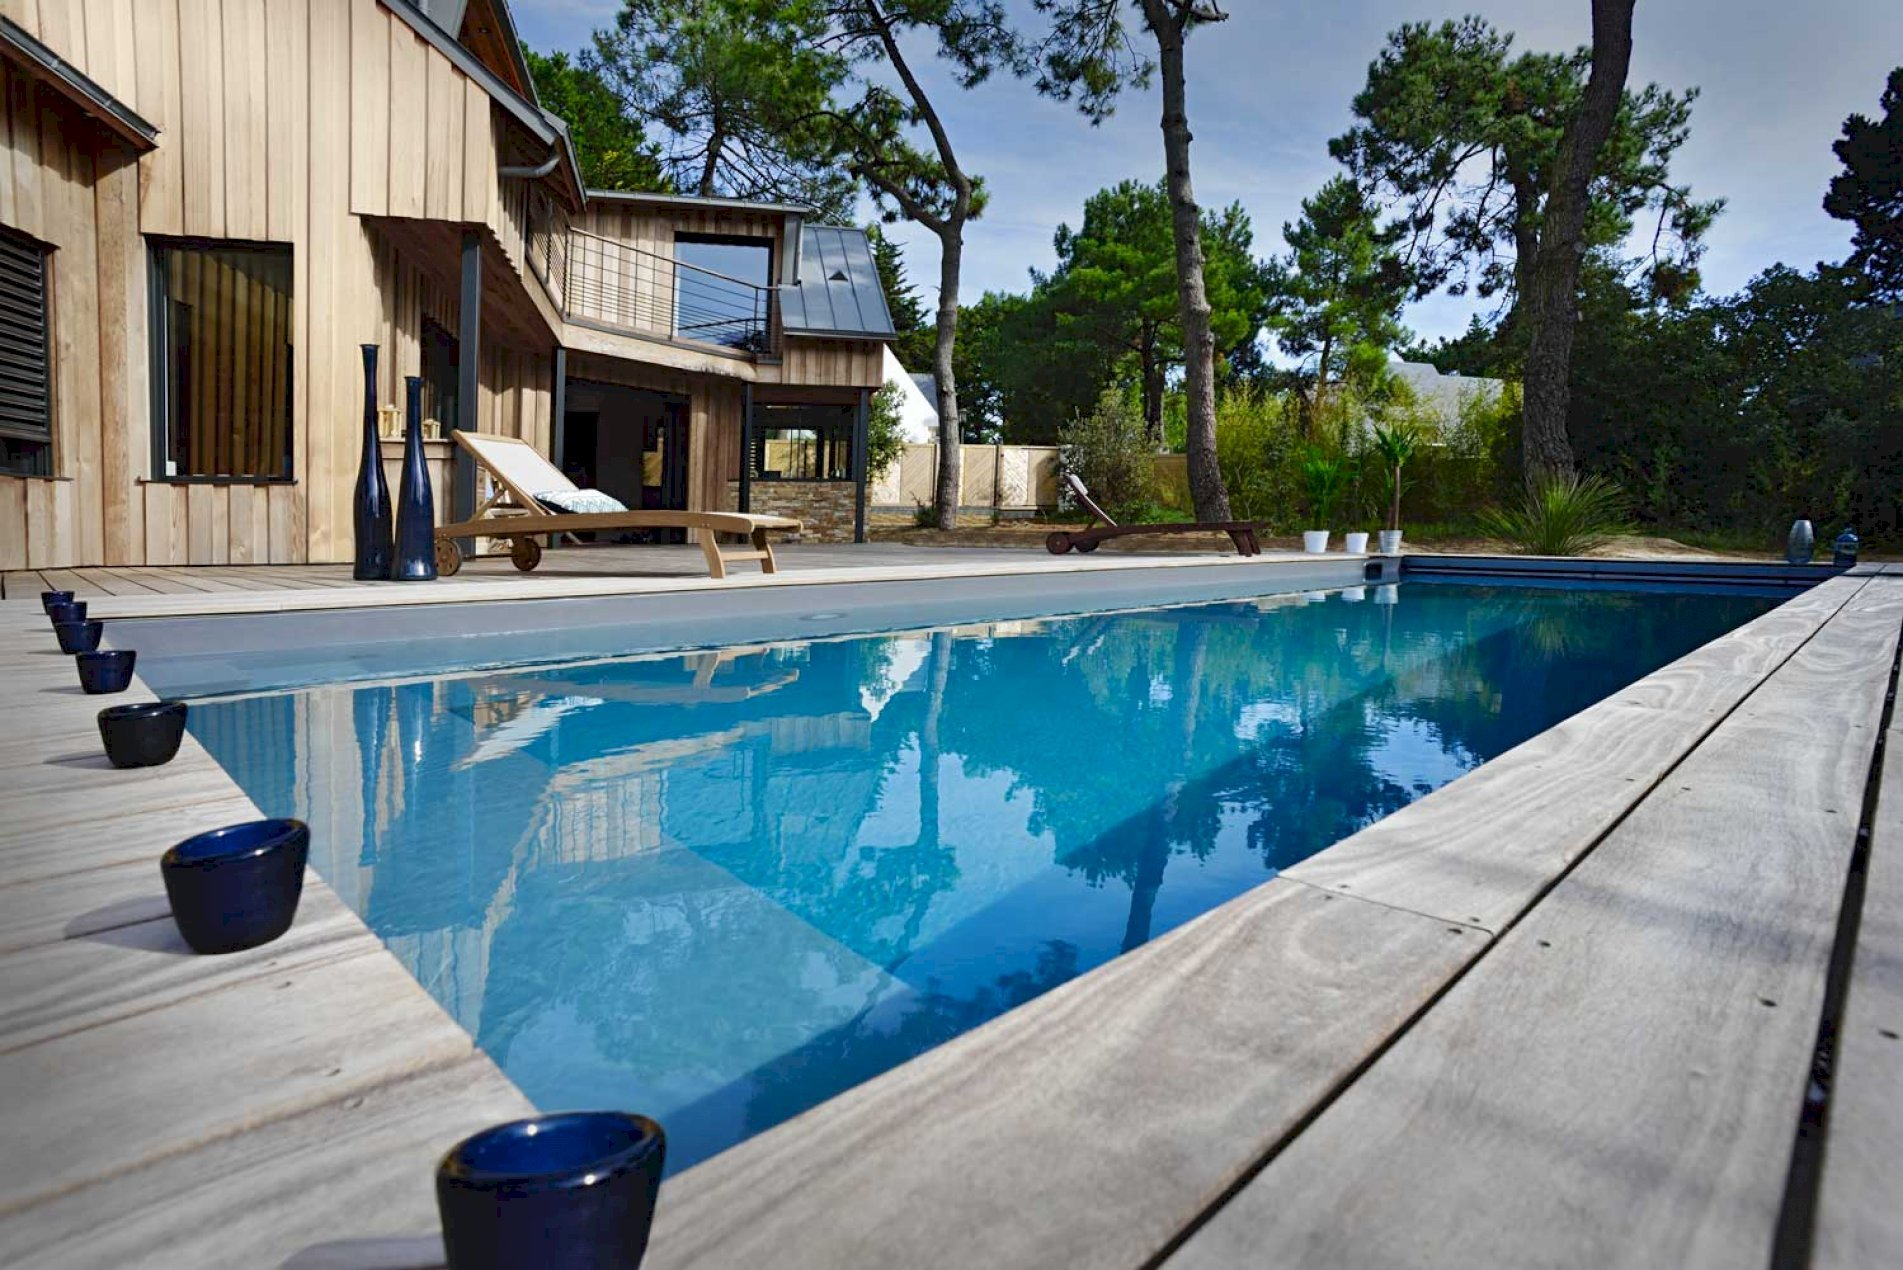 Le Bassin Bleu, constructeur de piscines en Gironde